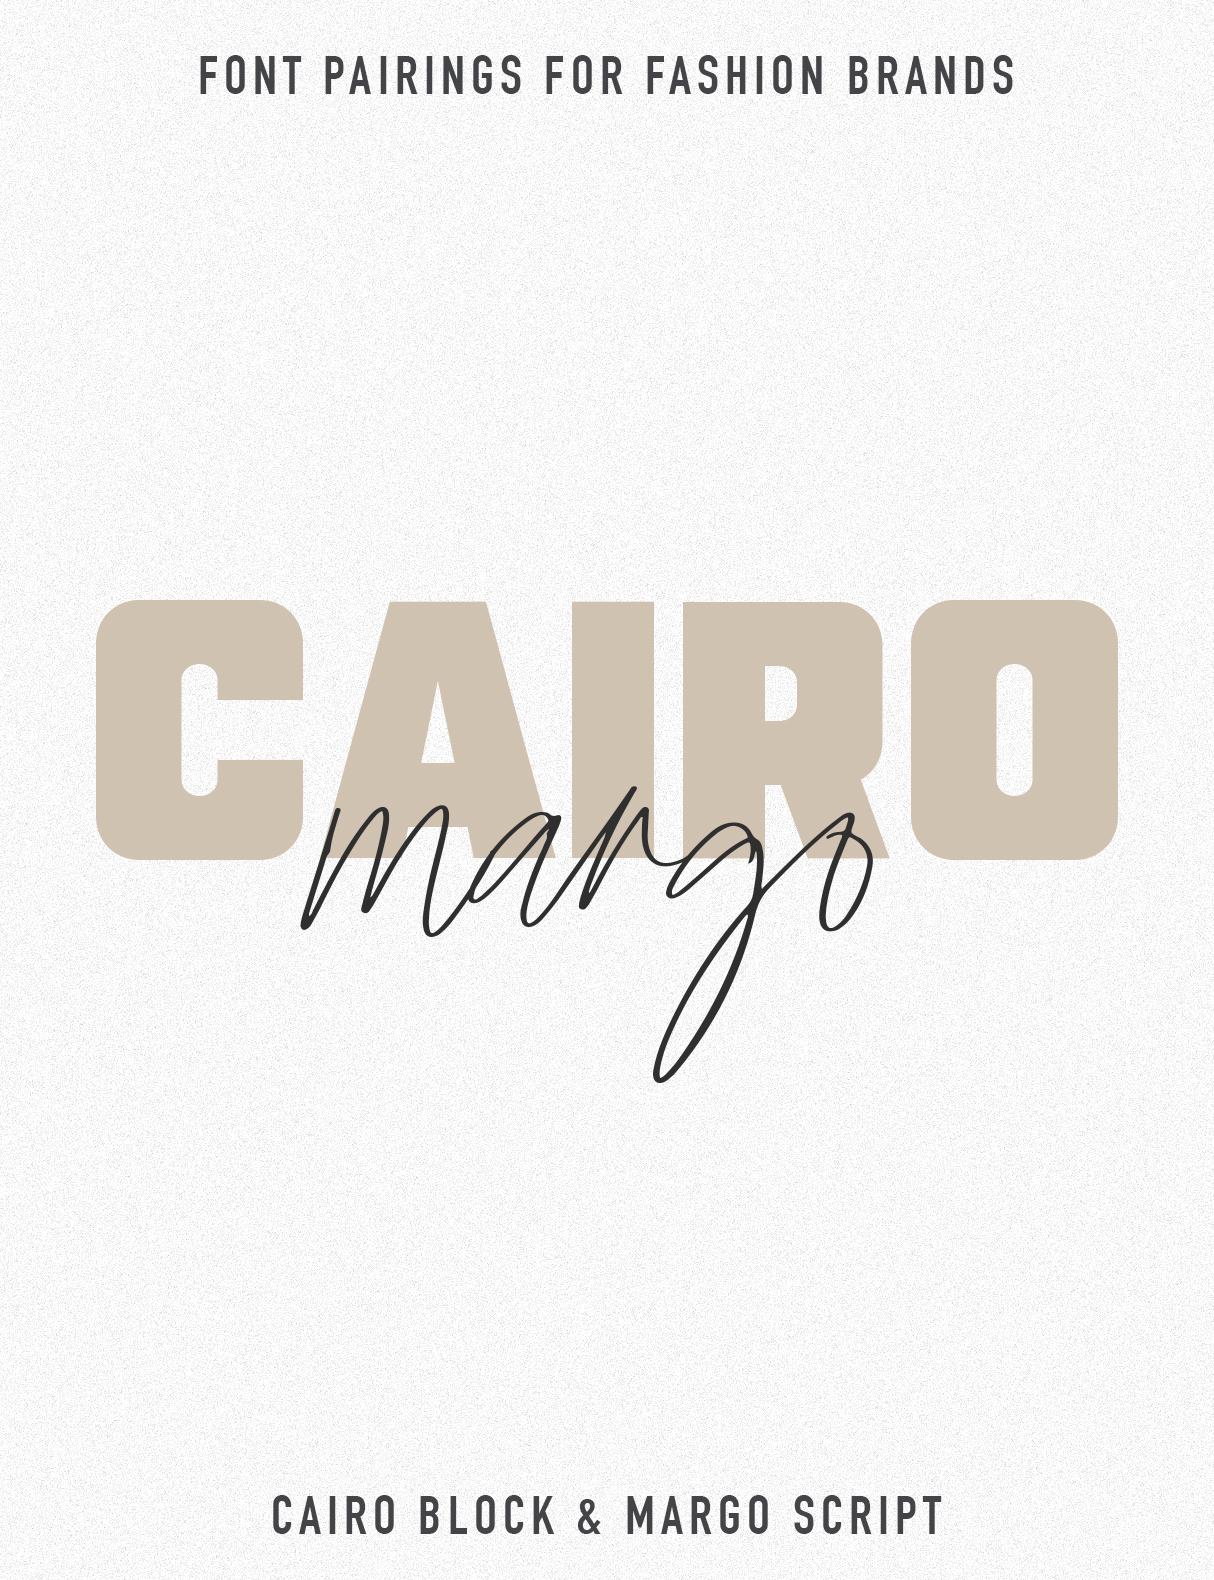 Jen Wagner Fashion Brand Font Pairings | Cairo Margo